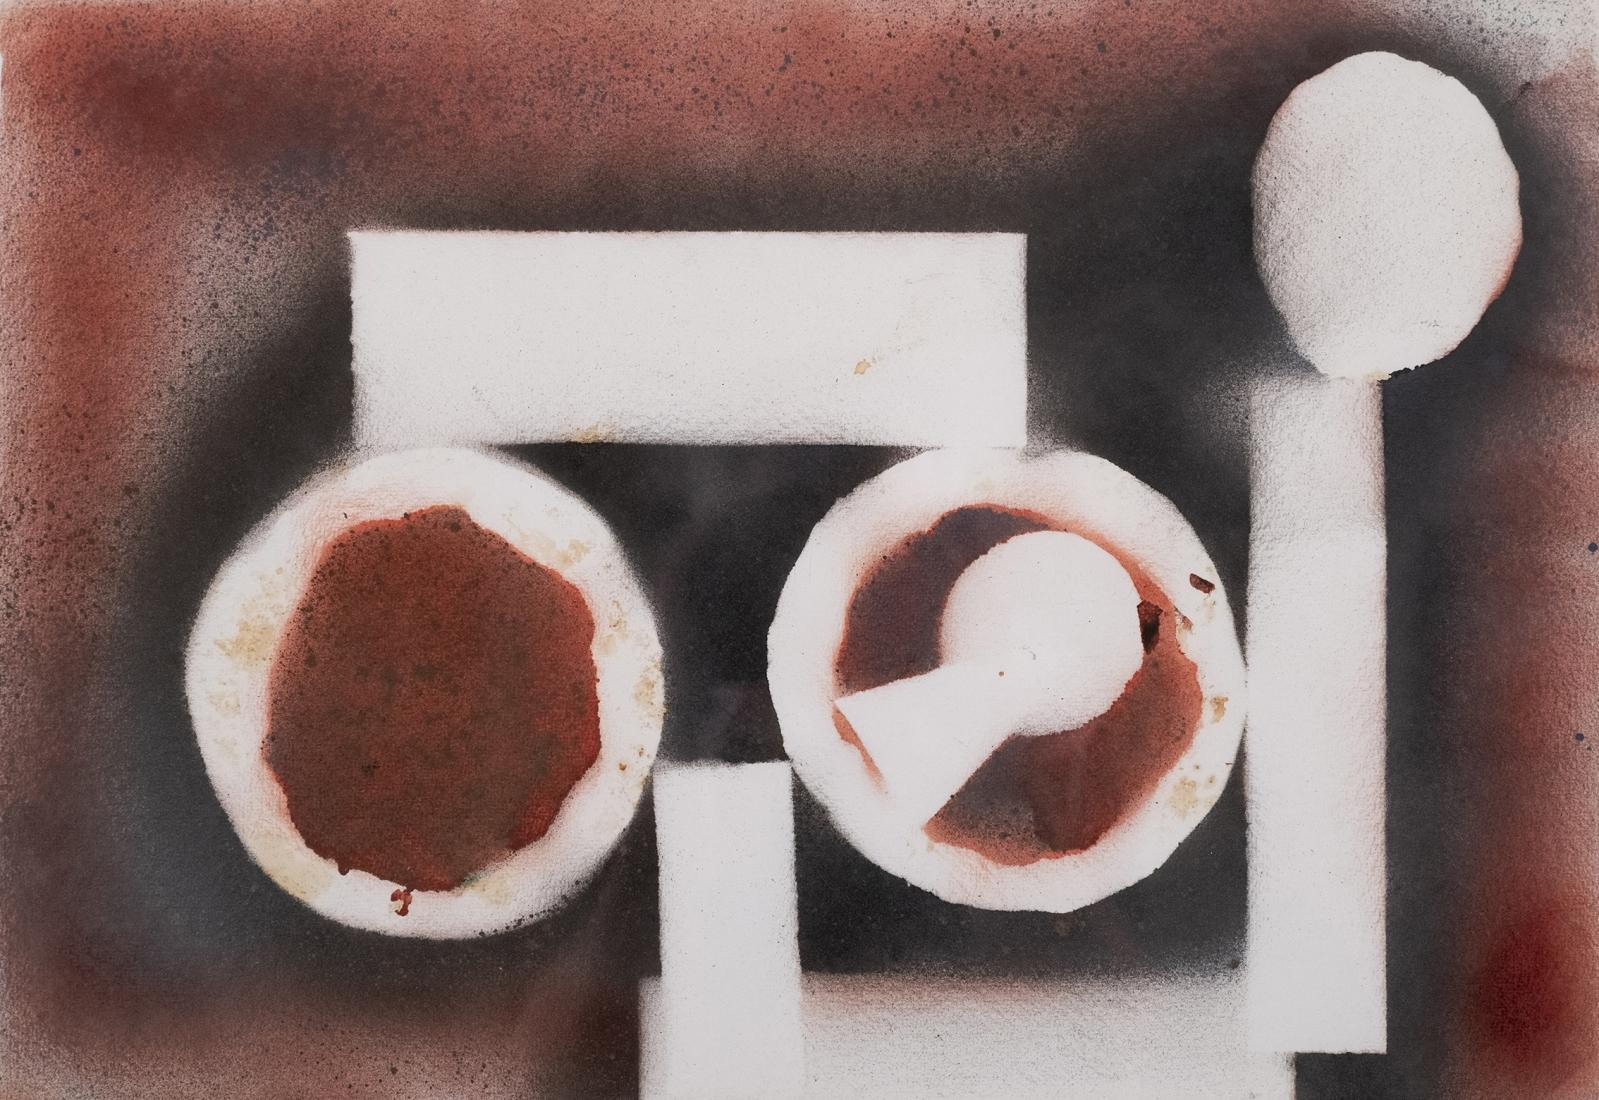 DAVID SMITH American, 1906-1965 . Untitled, 1962     Spray enamel on paper 21 x 27 in. (53.3 x 68.6 cm)